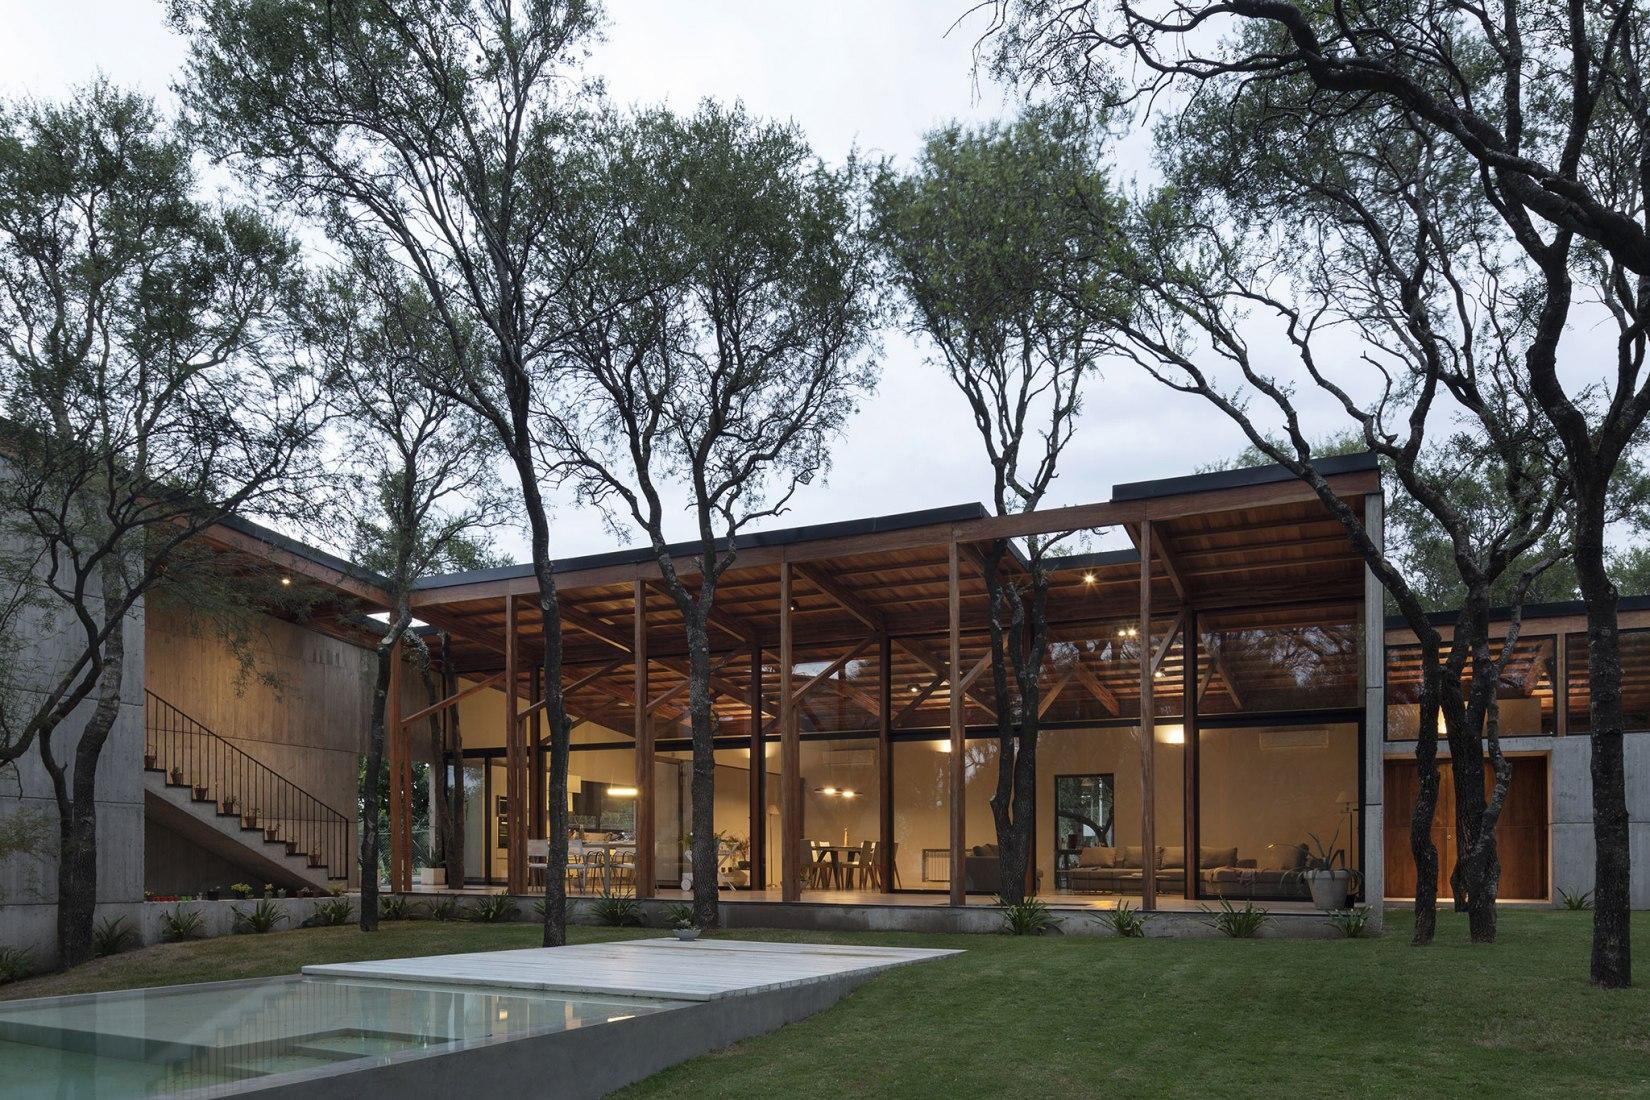 Casa BS por Alarcia Ferrer Arquitectos. Fotografía por Federico Cairoli.